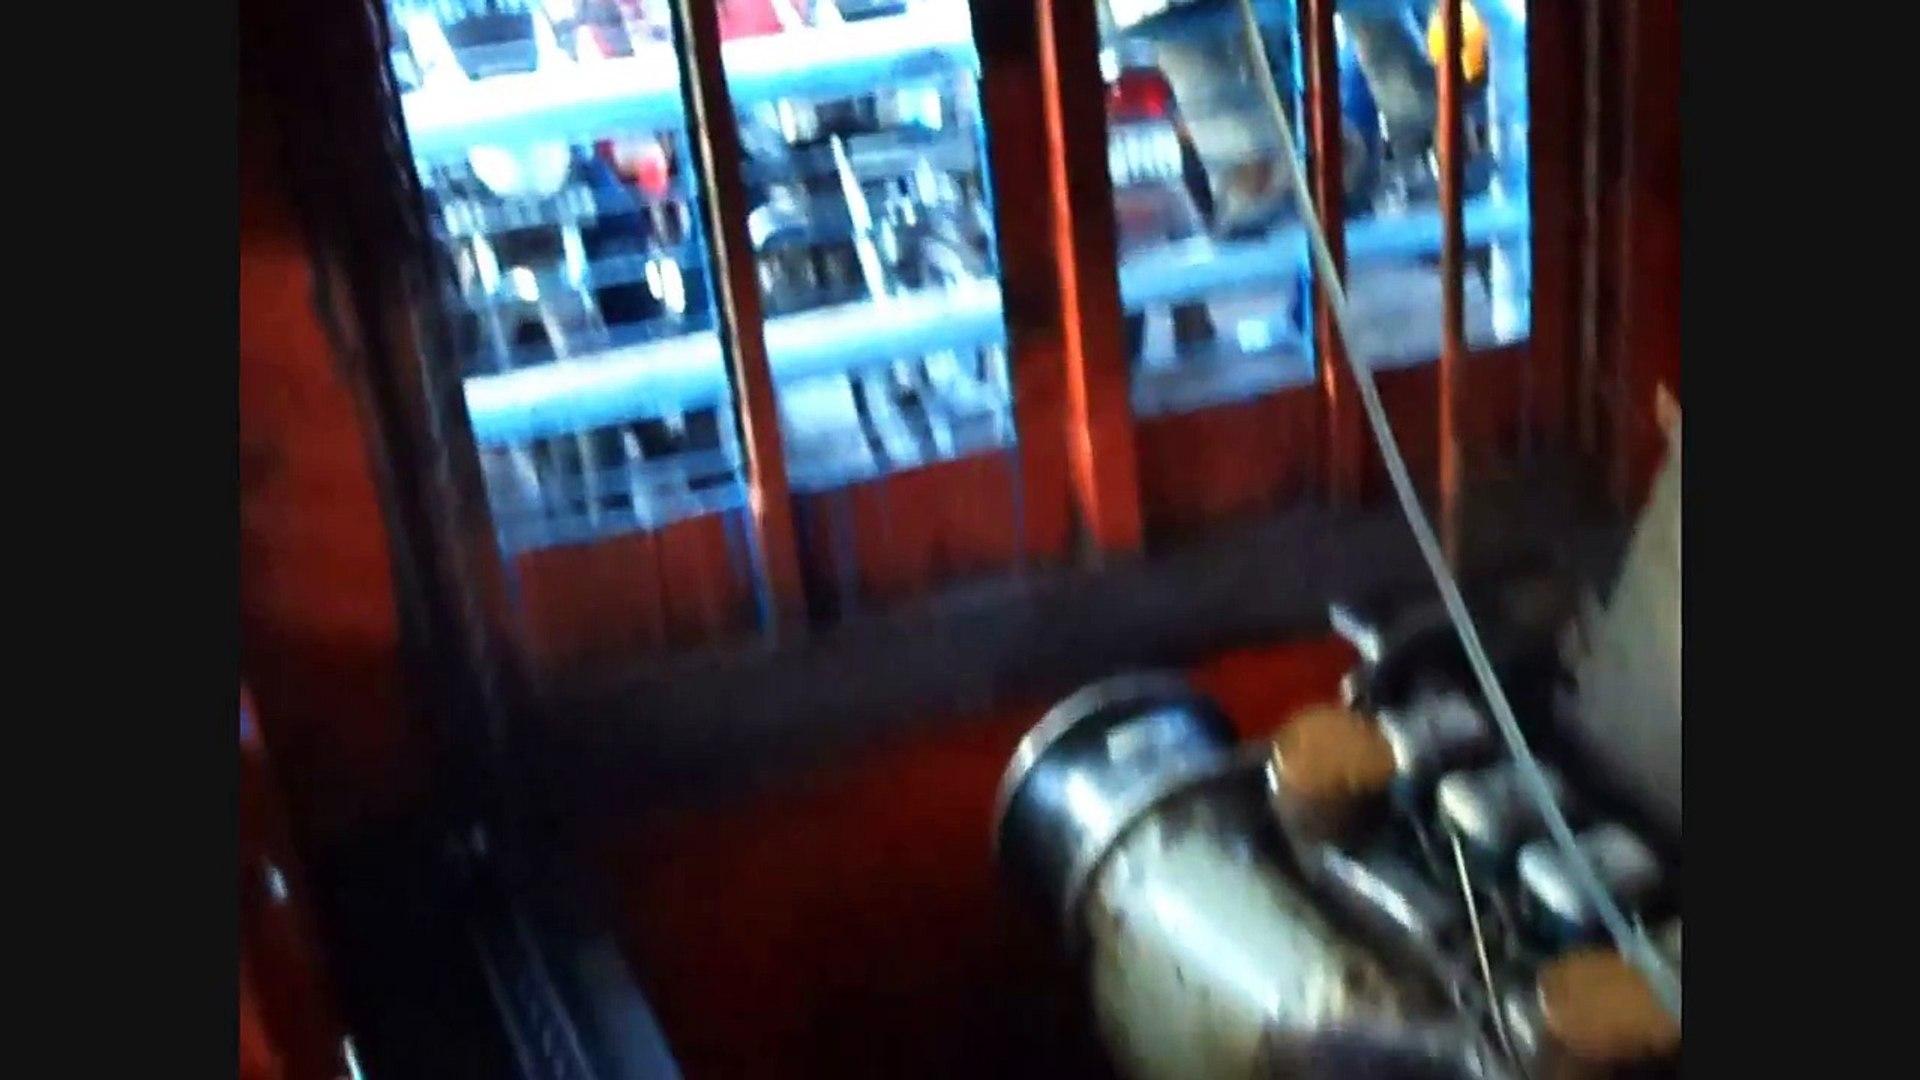 CANACONA PNJ-461 Ferry RUSTON & HORNSBY (INDIA LTD...) L6YDAXM-(MK.2) Engine Room In Action...